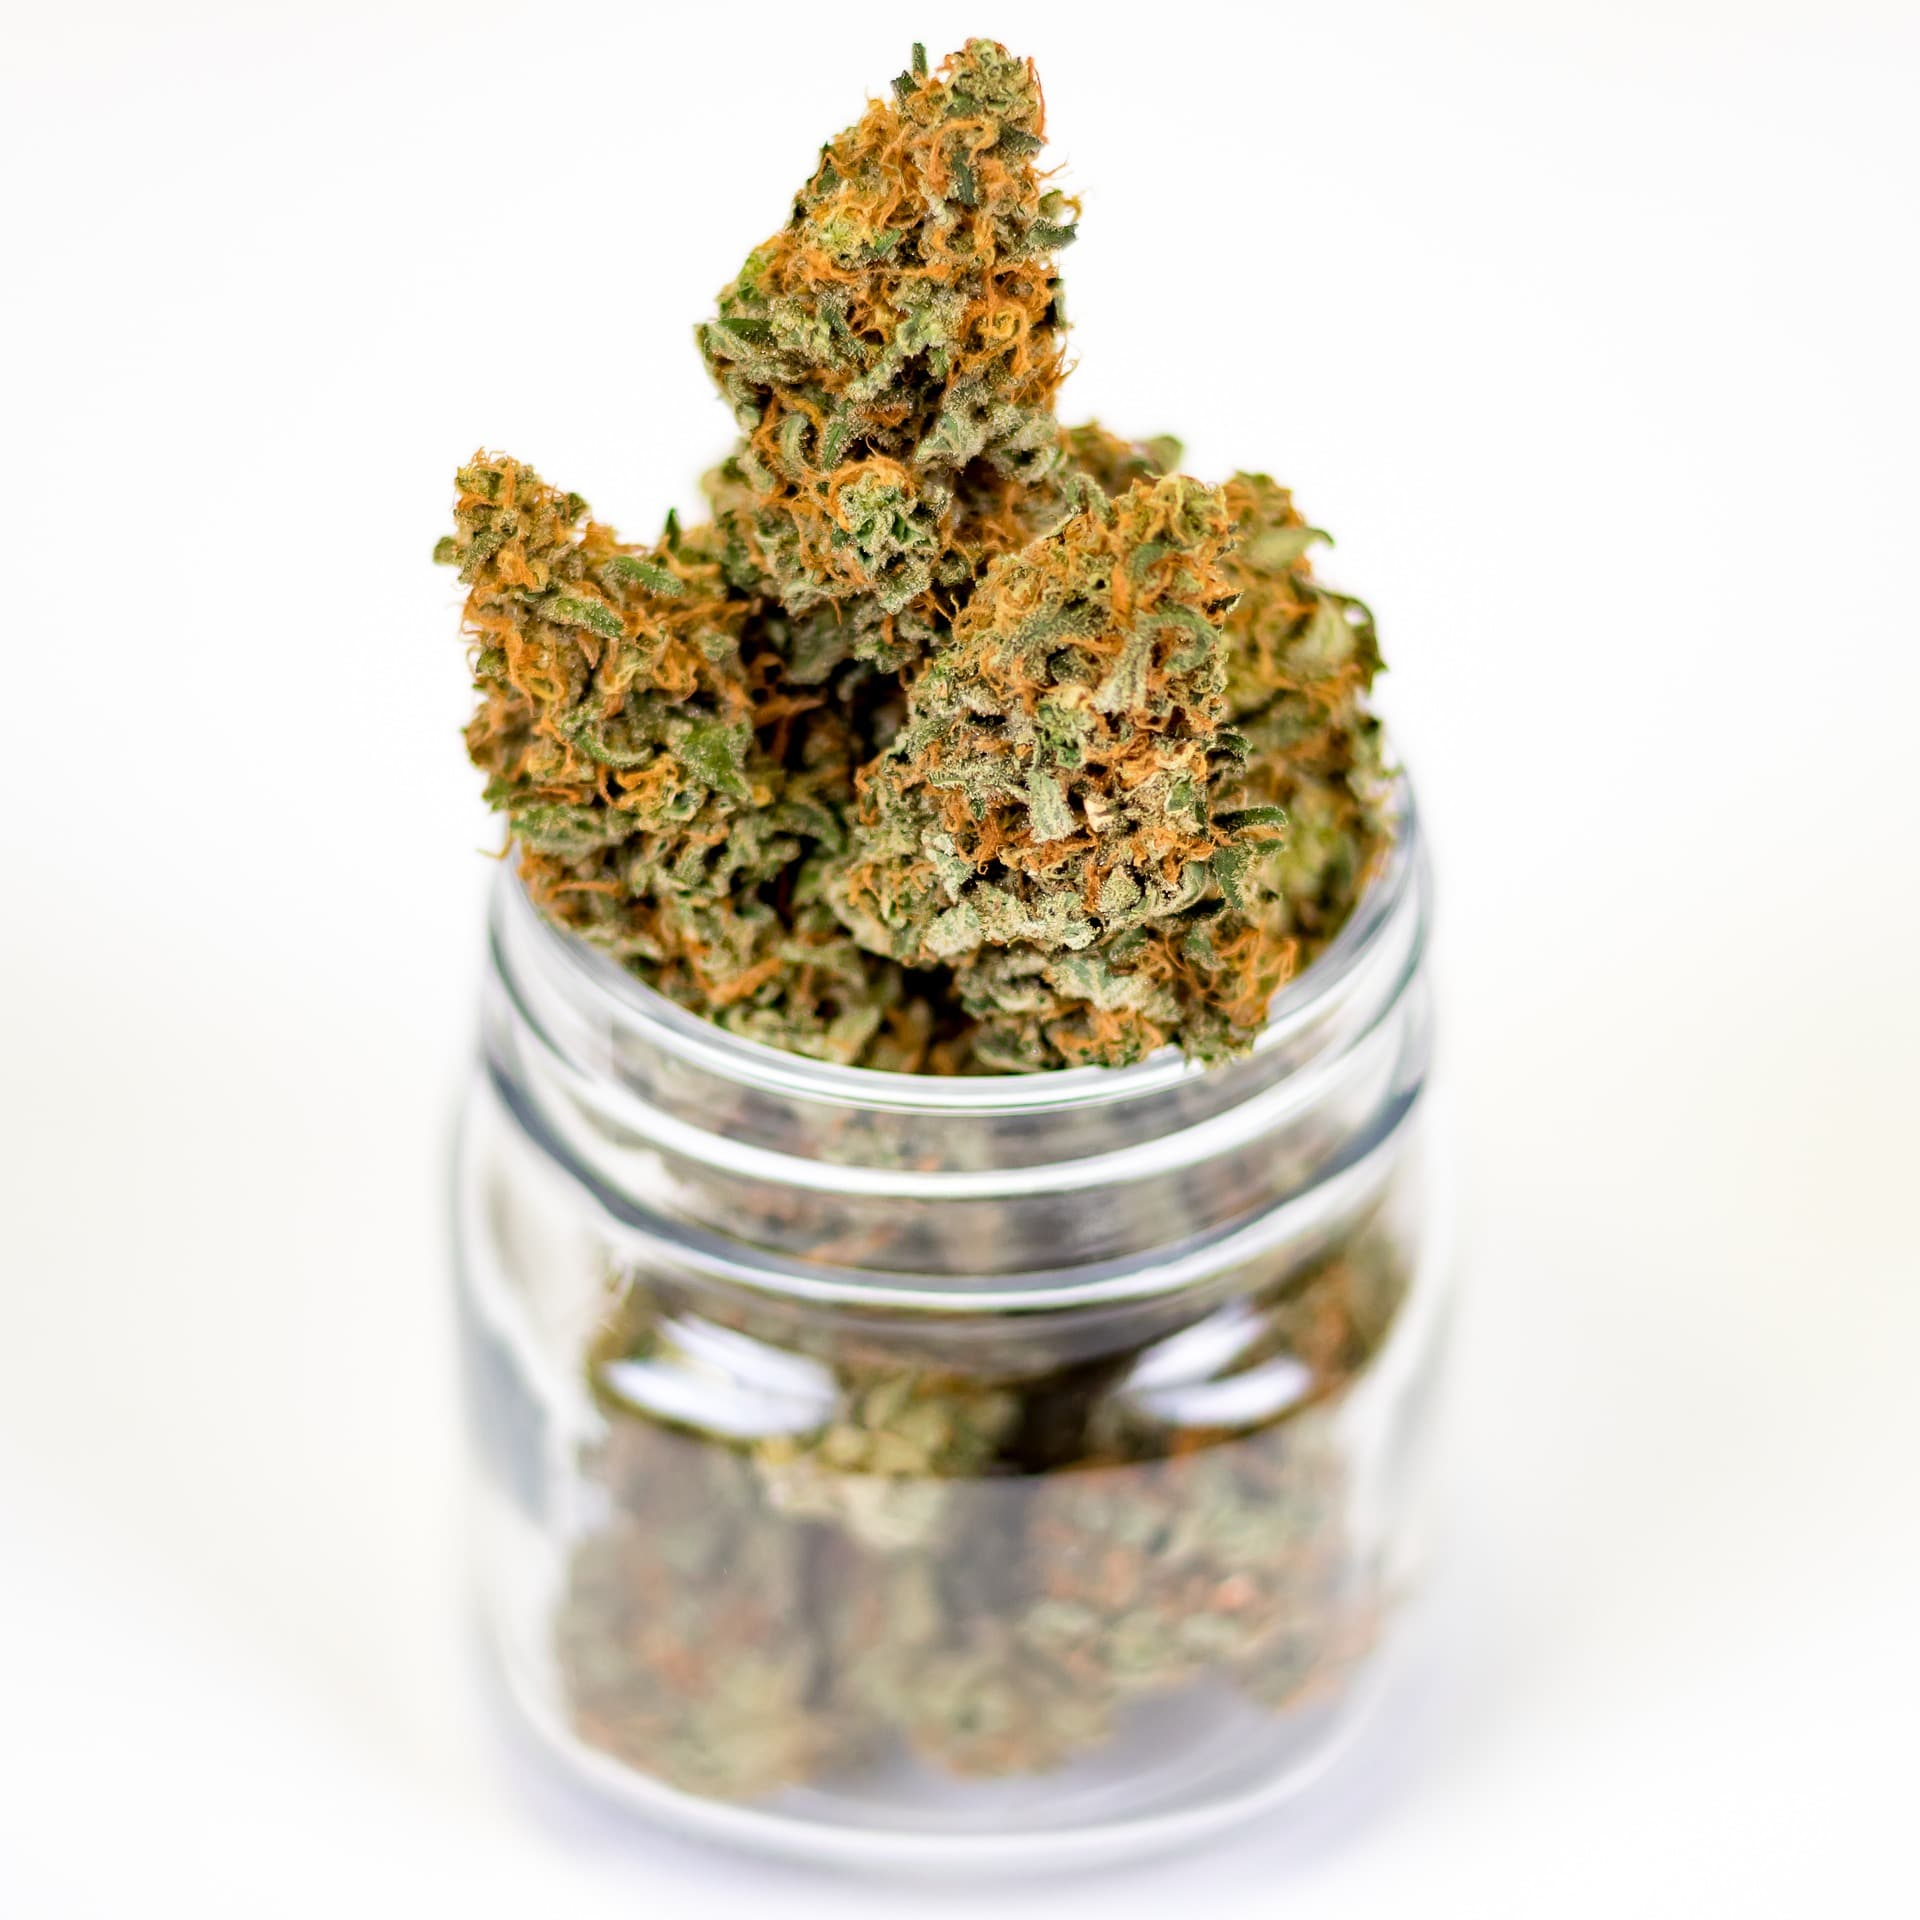 Nación Cannabis | Gobierno paraguayo da primer paso para industrializar cannabis medicinal